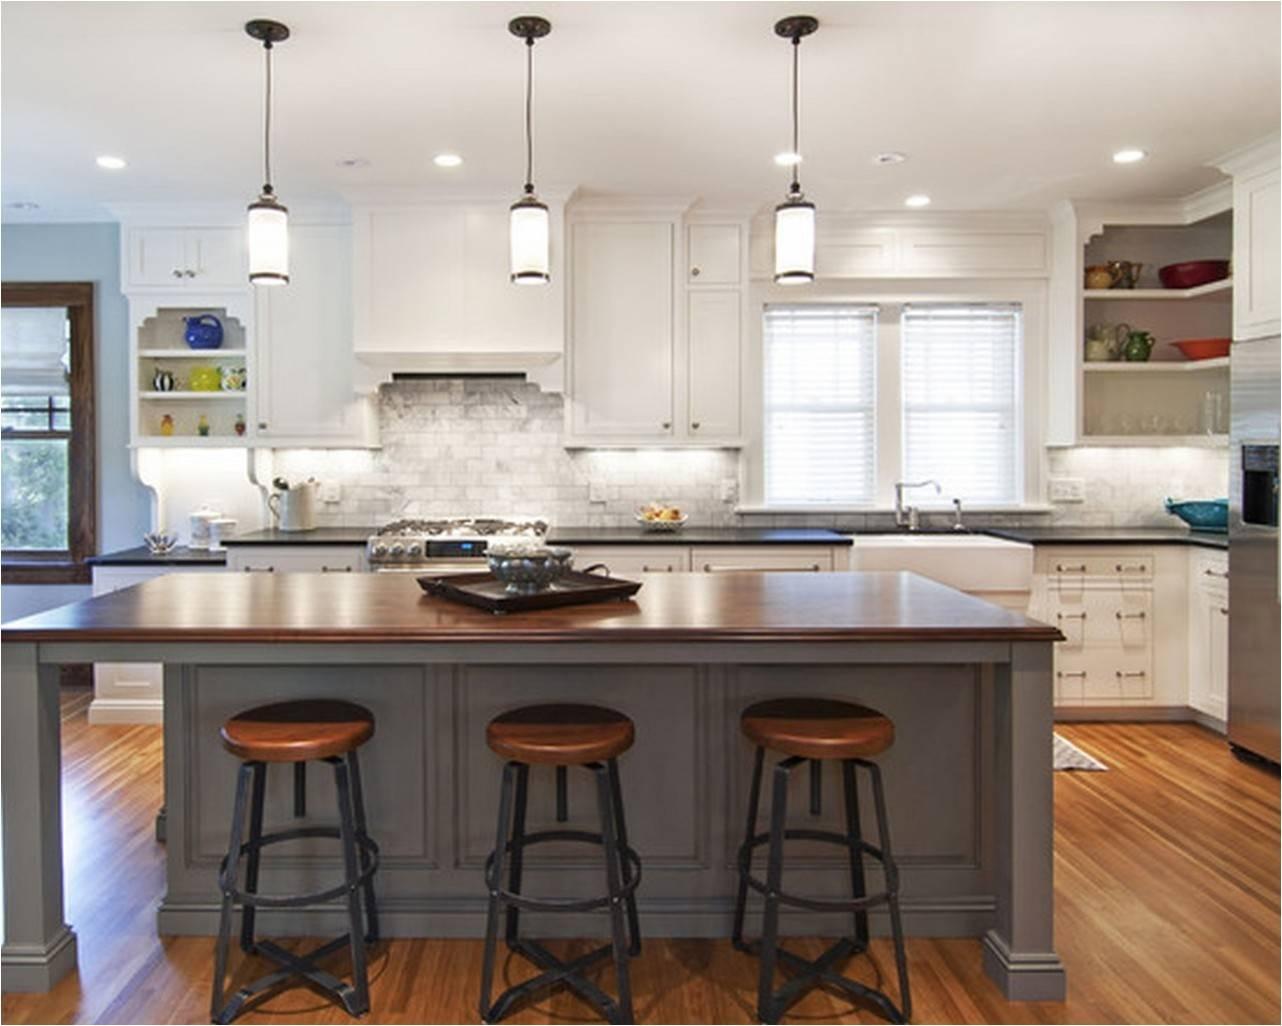 pendant lighting kitchen 5. fancy rustic pendant lighting kitchen 47 for double light lights 5 s